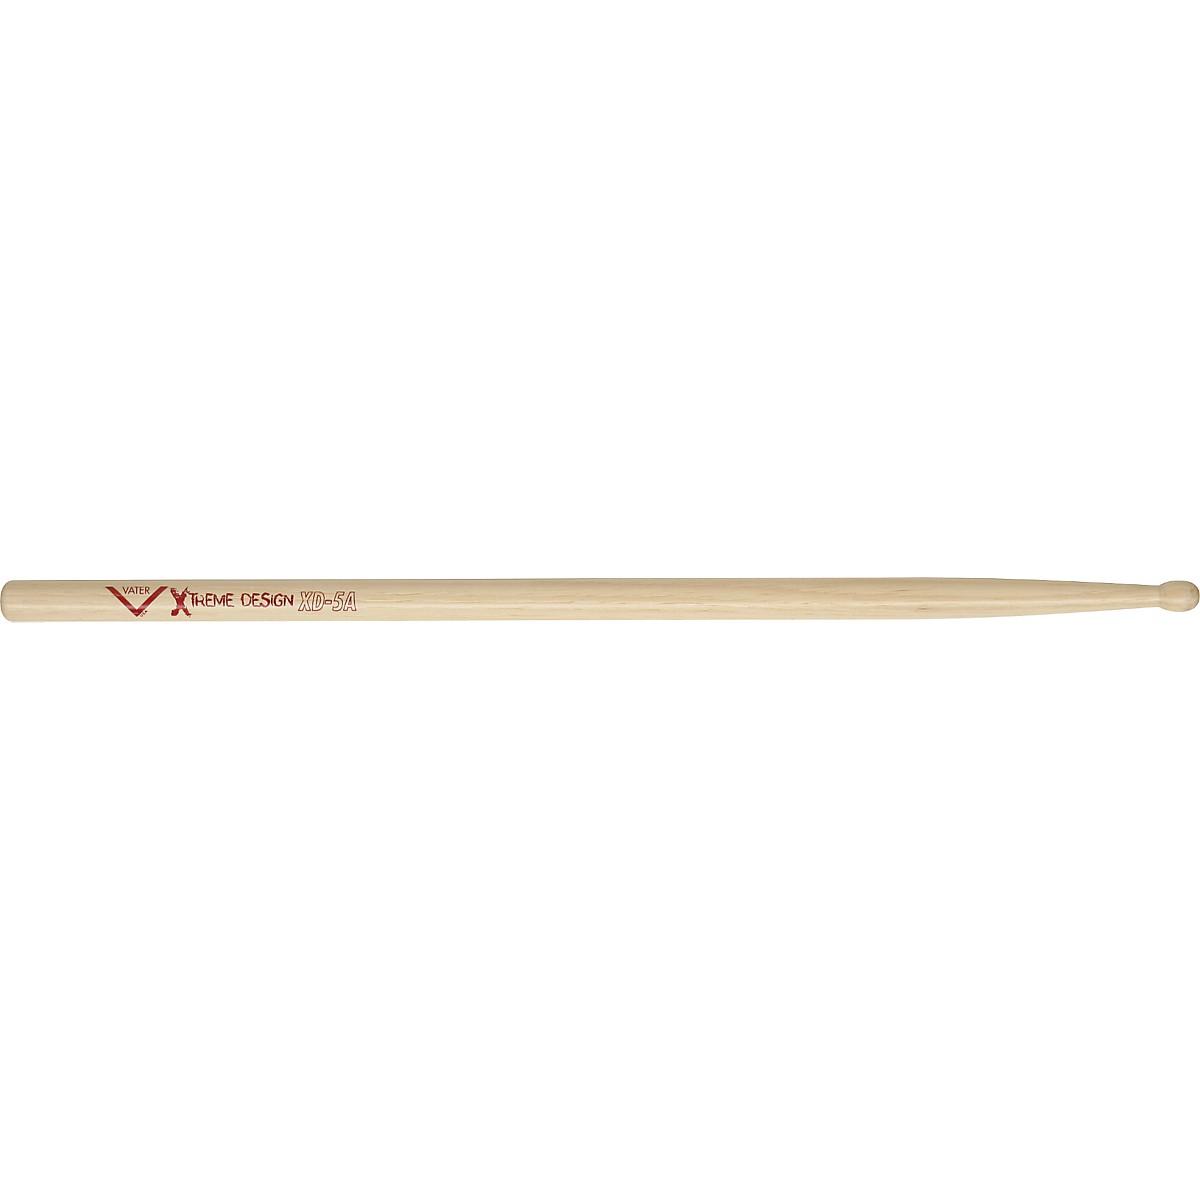 Vater Xtreme Design Drum Sticks